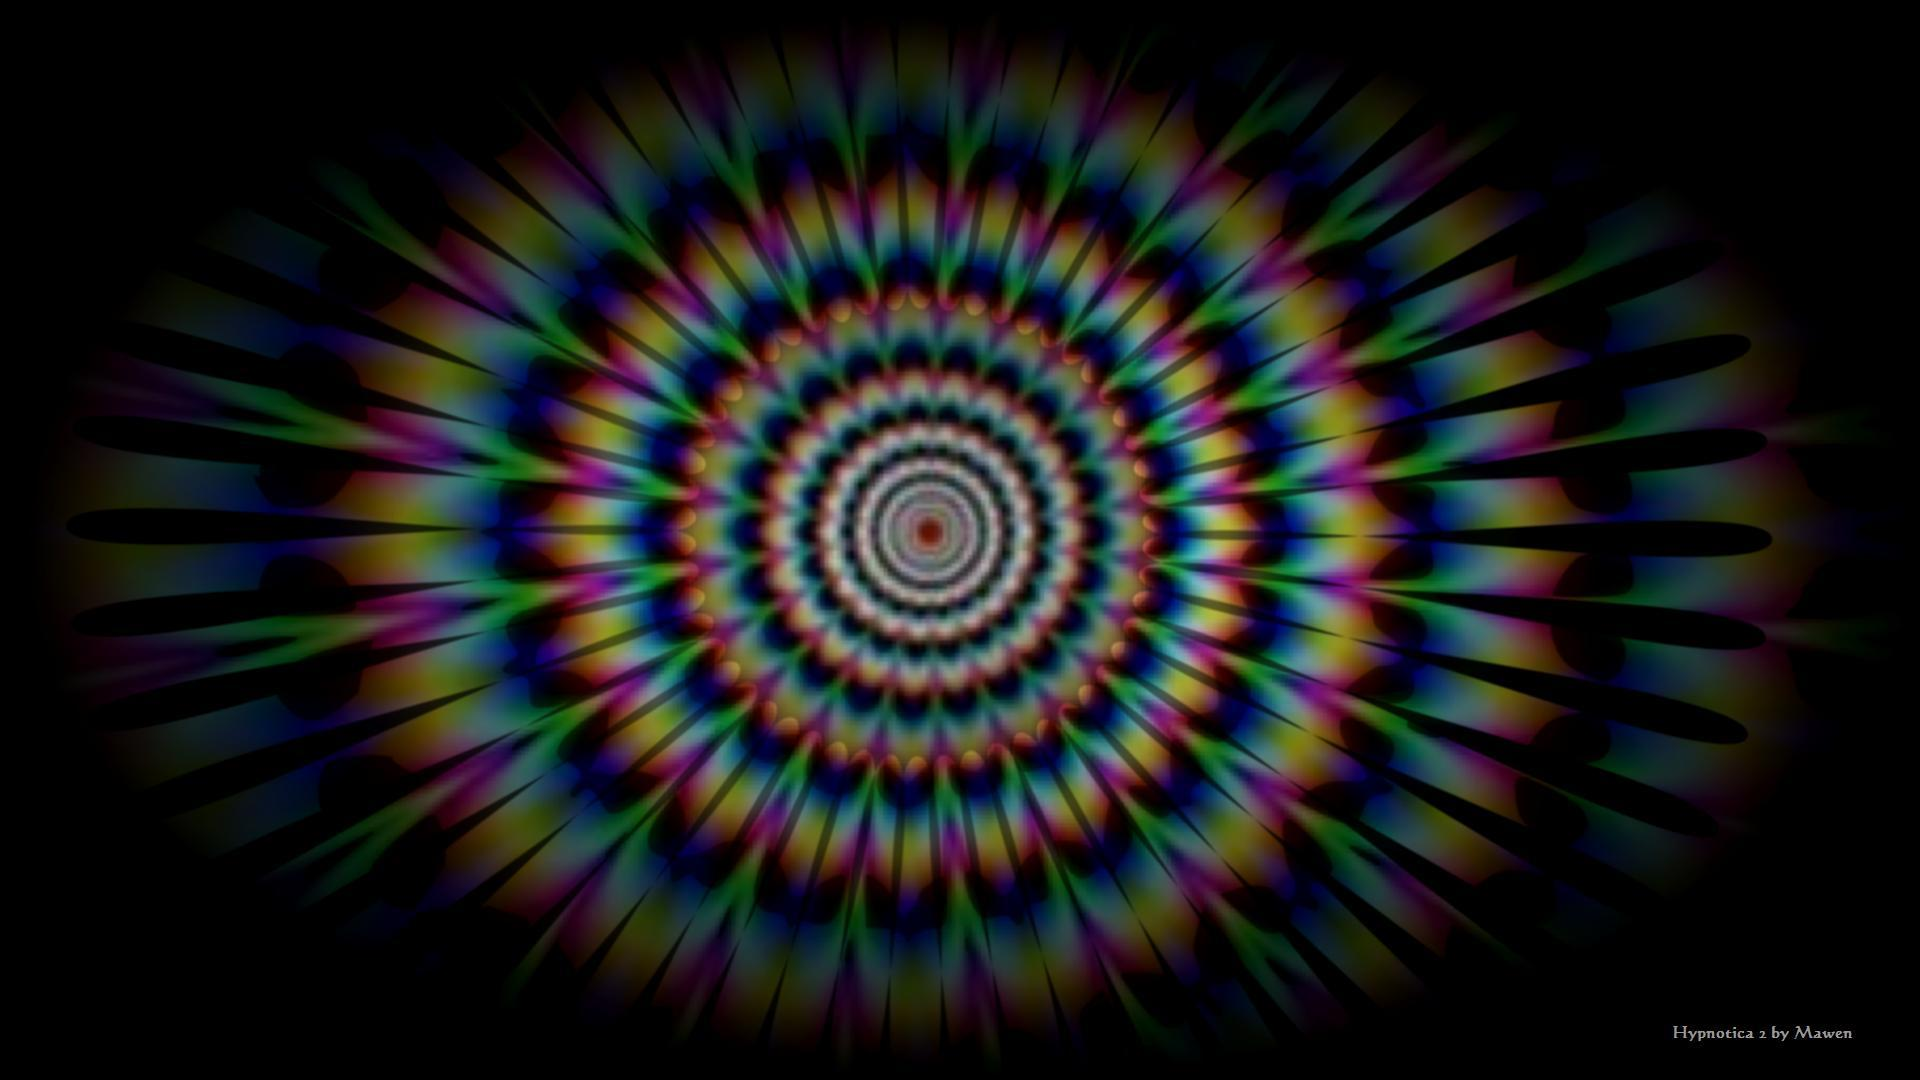 hypnosis moving wallpaper hypnotic - photo #14